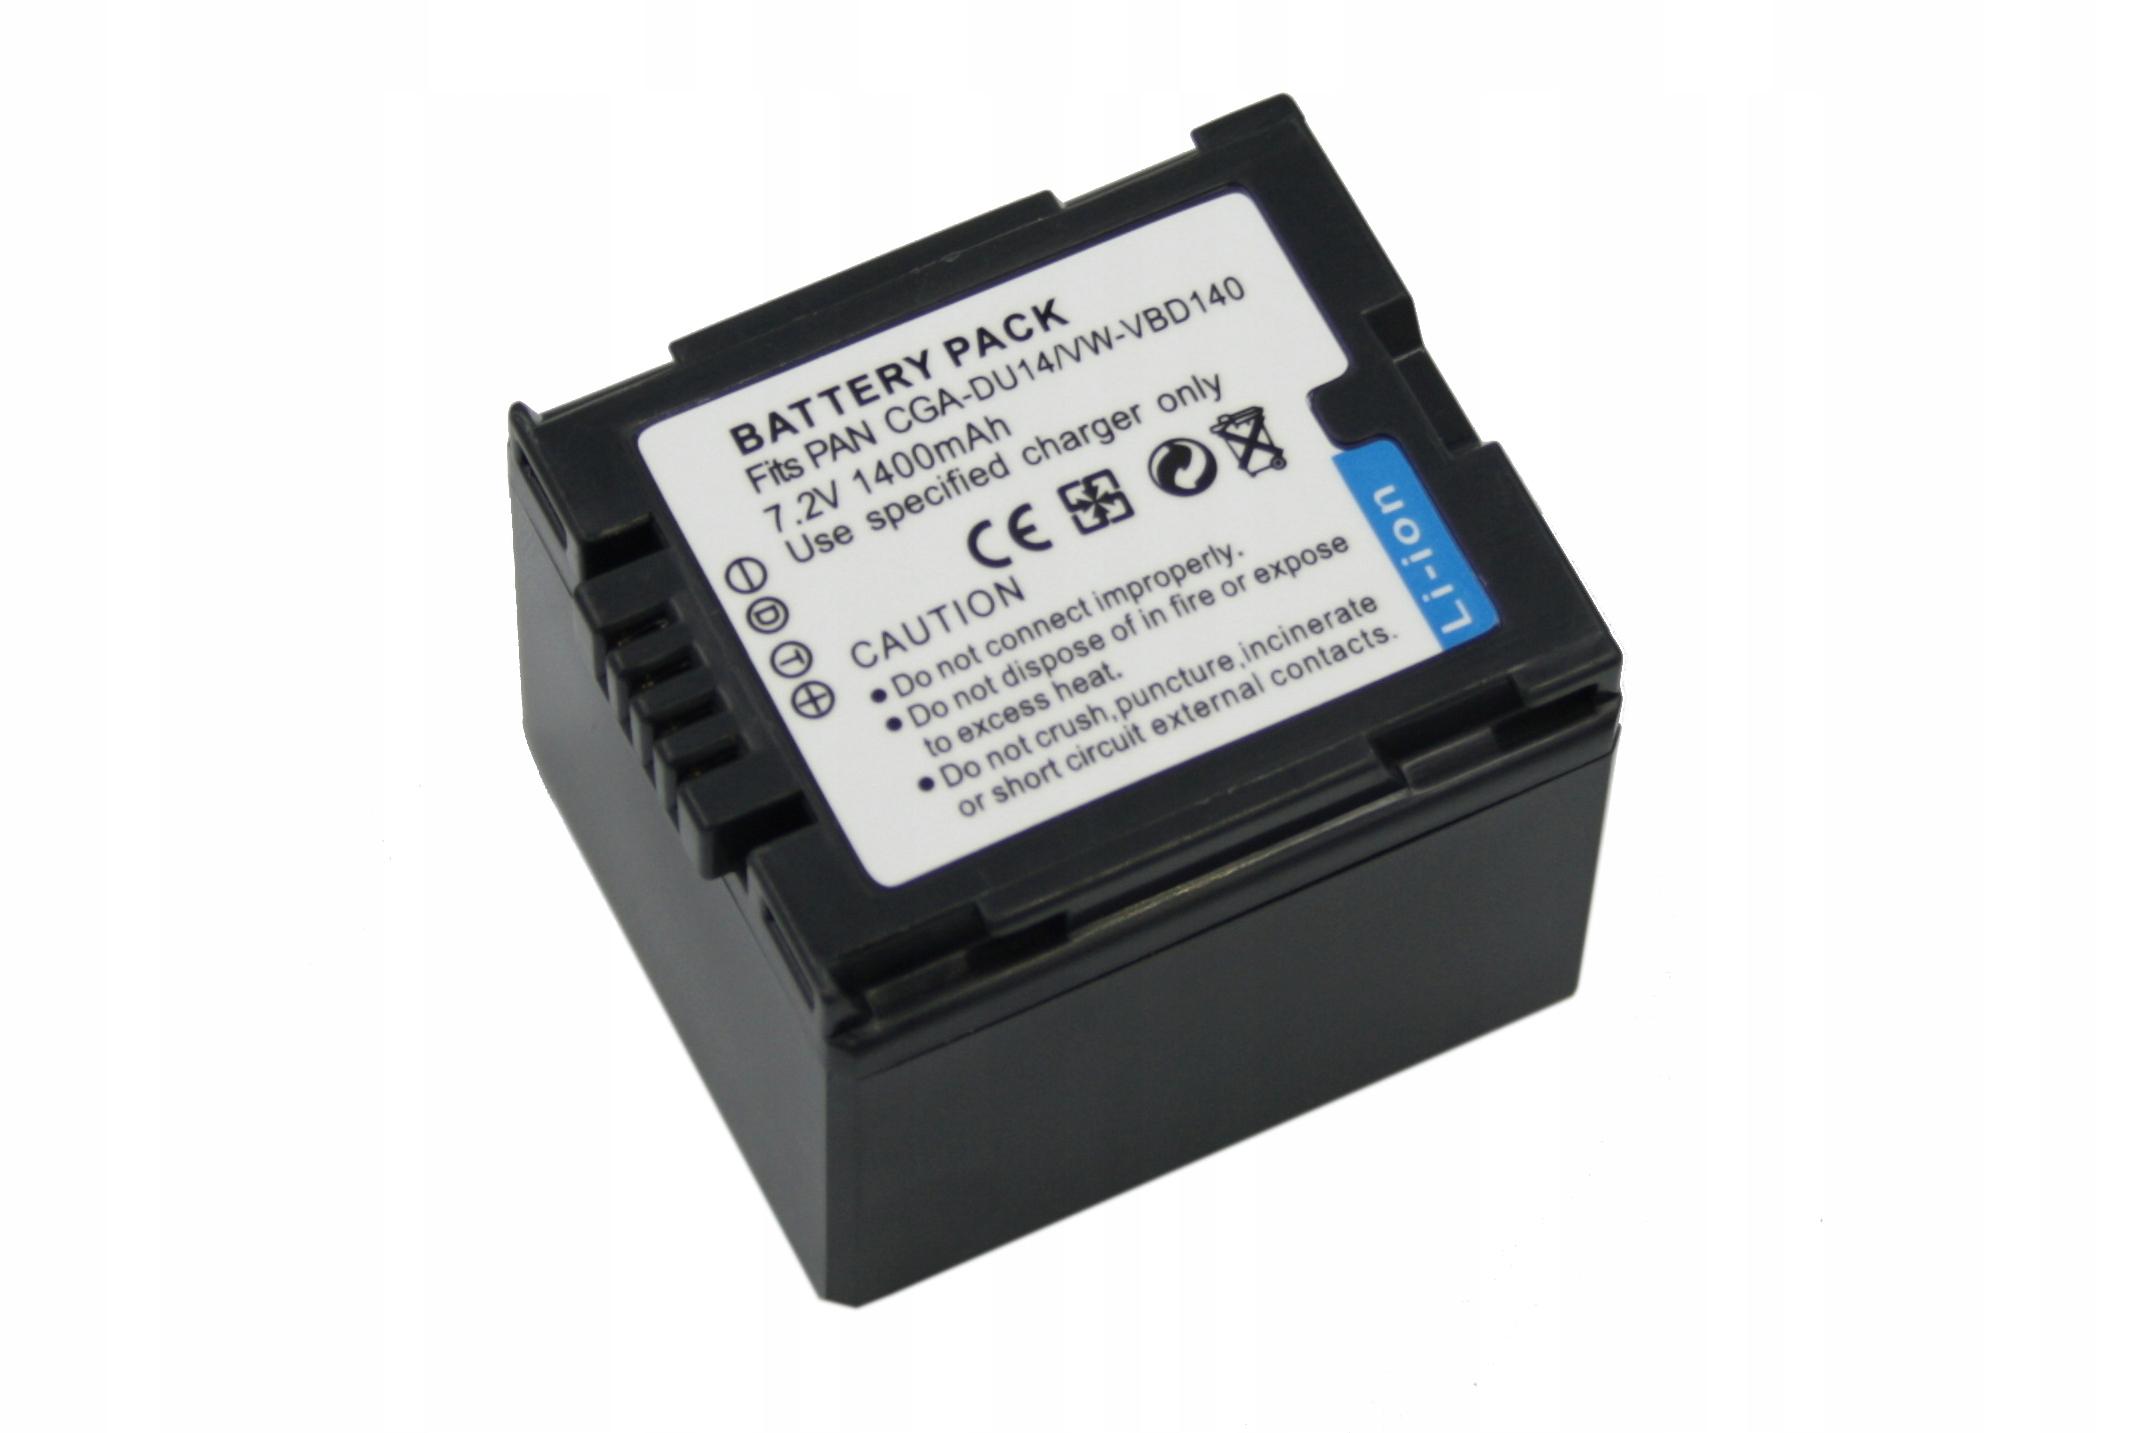 BATERIA AKUMULATOR PANASONIC CGA-DU21 CGA-DU06 CGR-DU06 - Baterie do aparatów cyfrowych